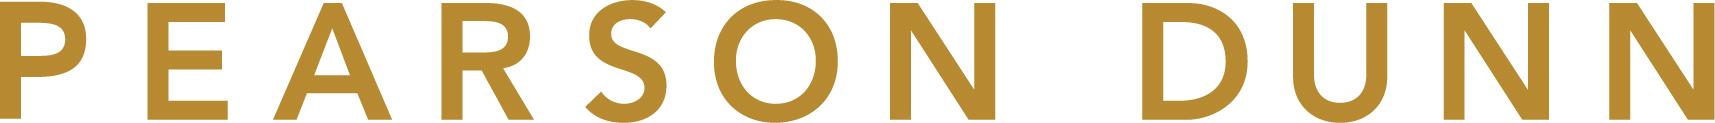 SILVER SPONSOR - PEARSON DUNN INSURANCE INC. - Logo